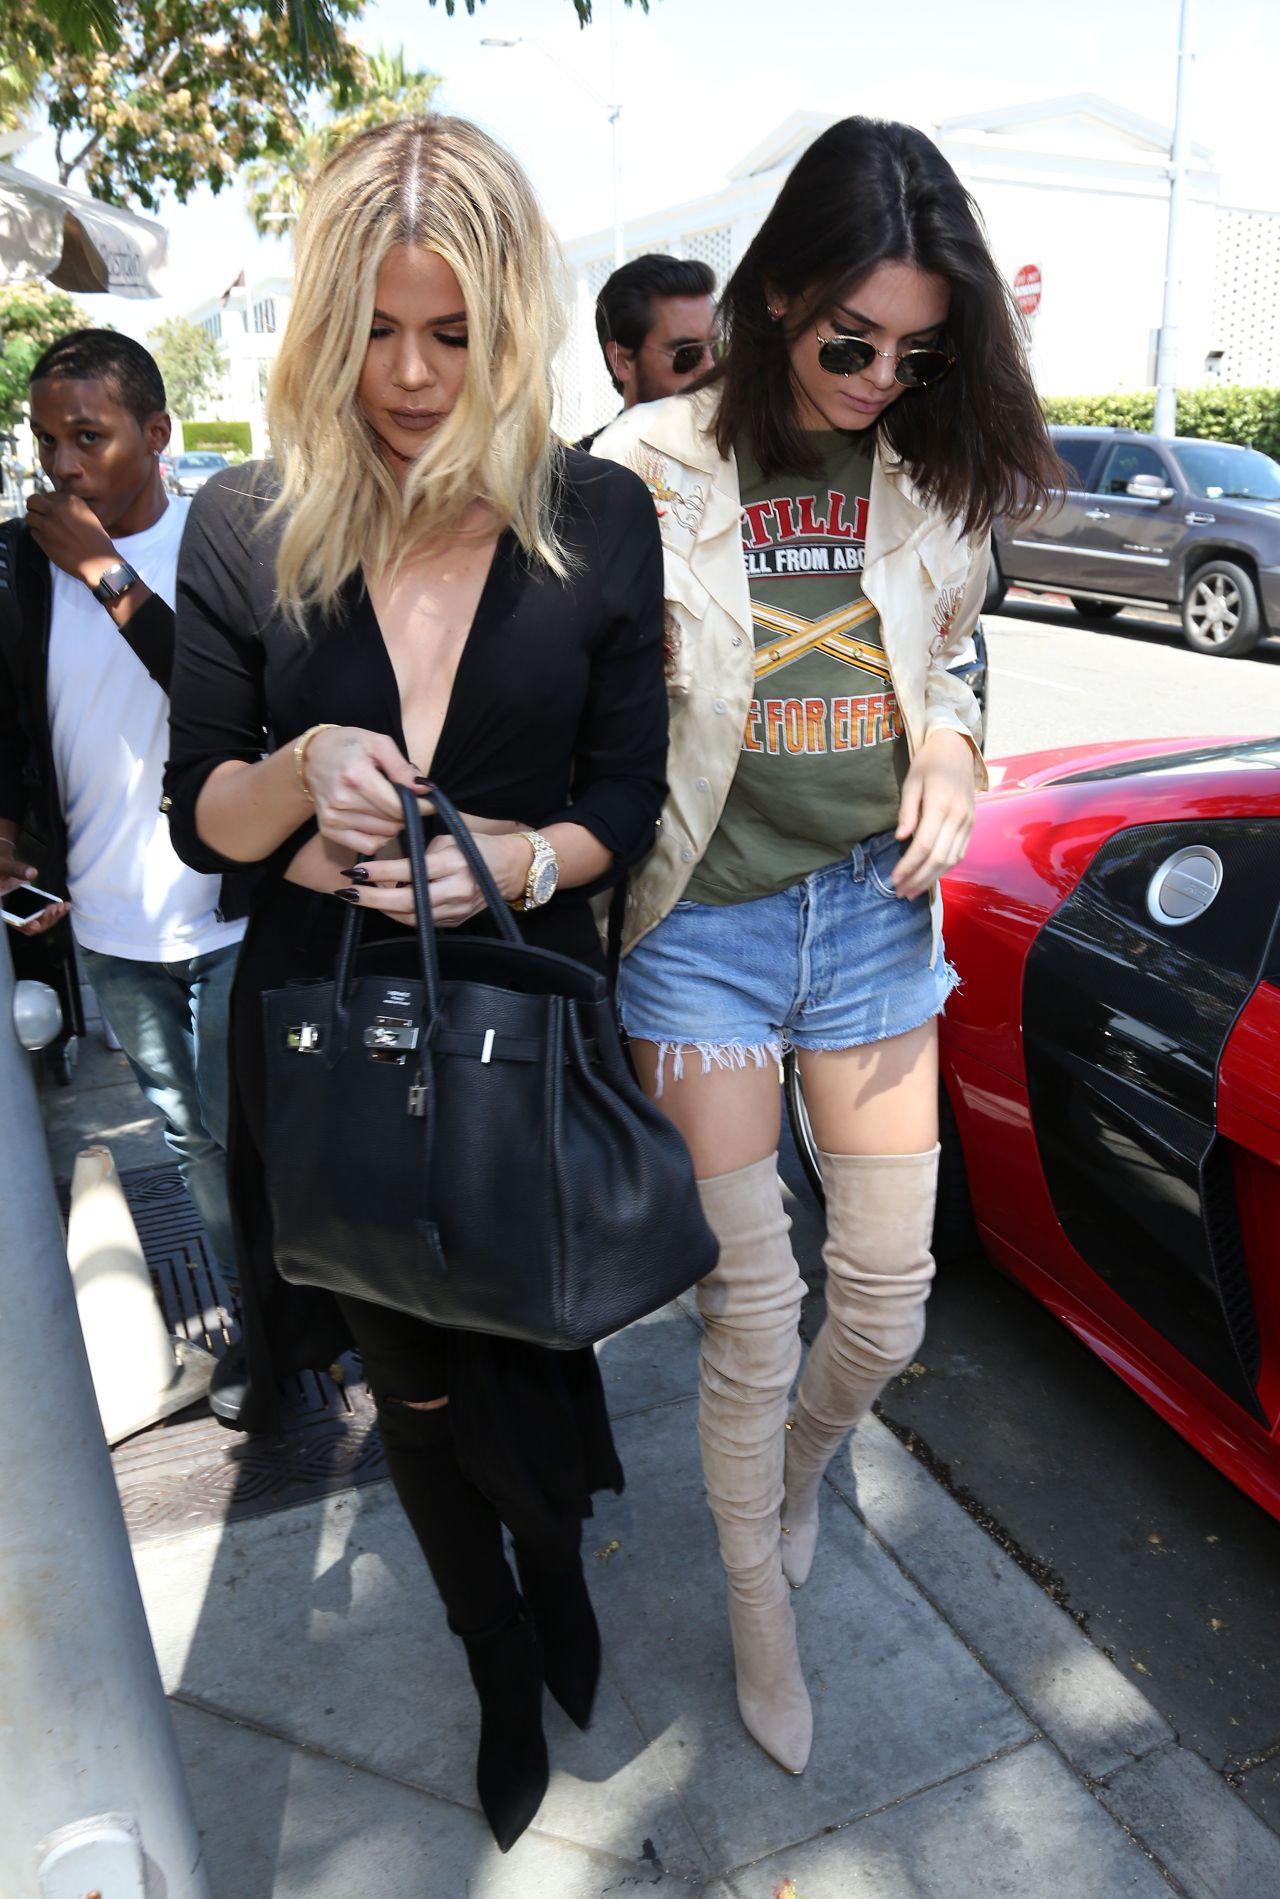 Khloe kardashian at il pastaio restaurant in beverly hills